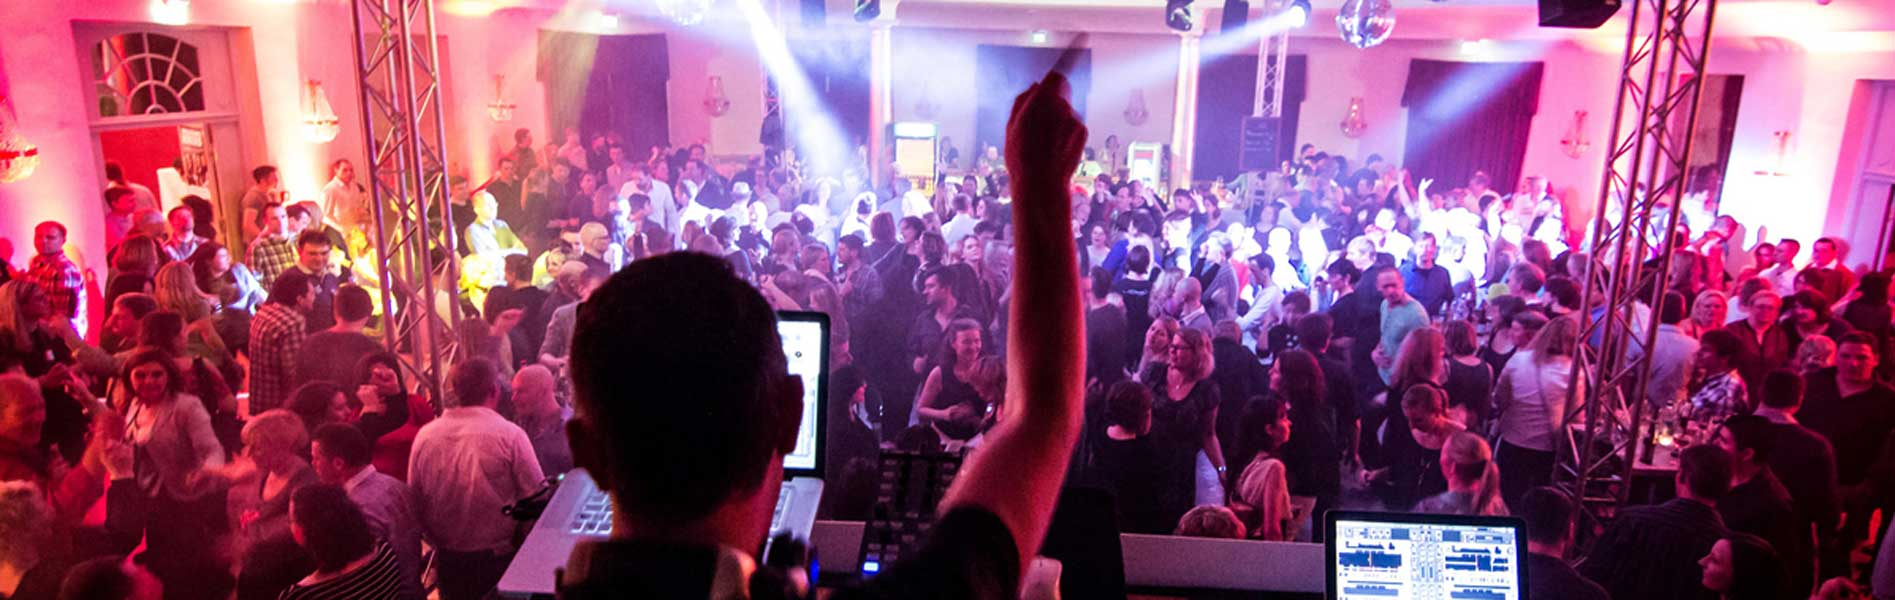 Unikorn Catering & Events-DJ München